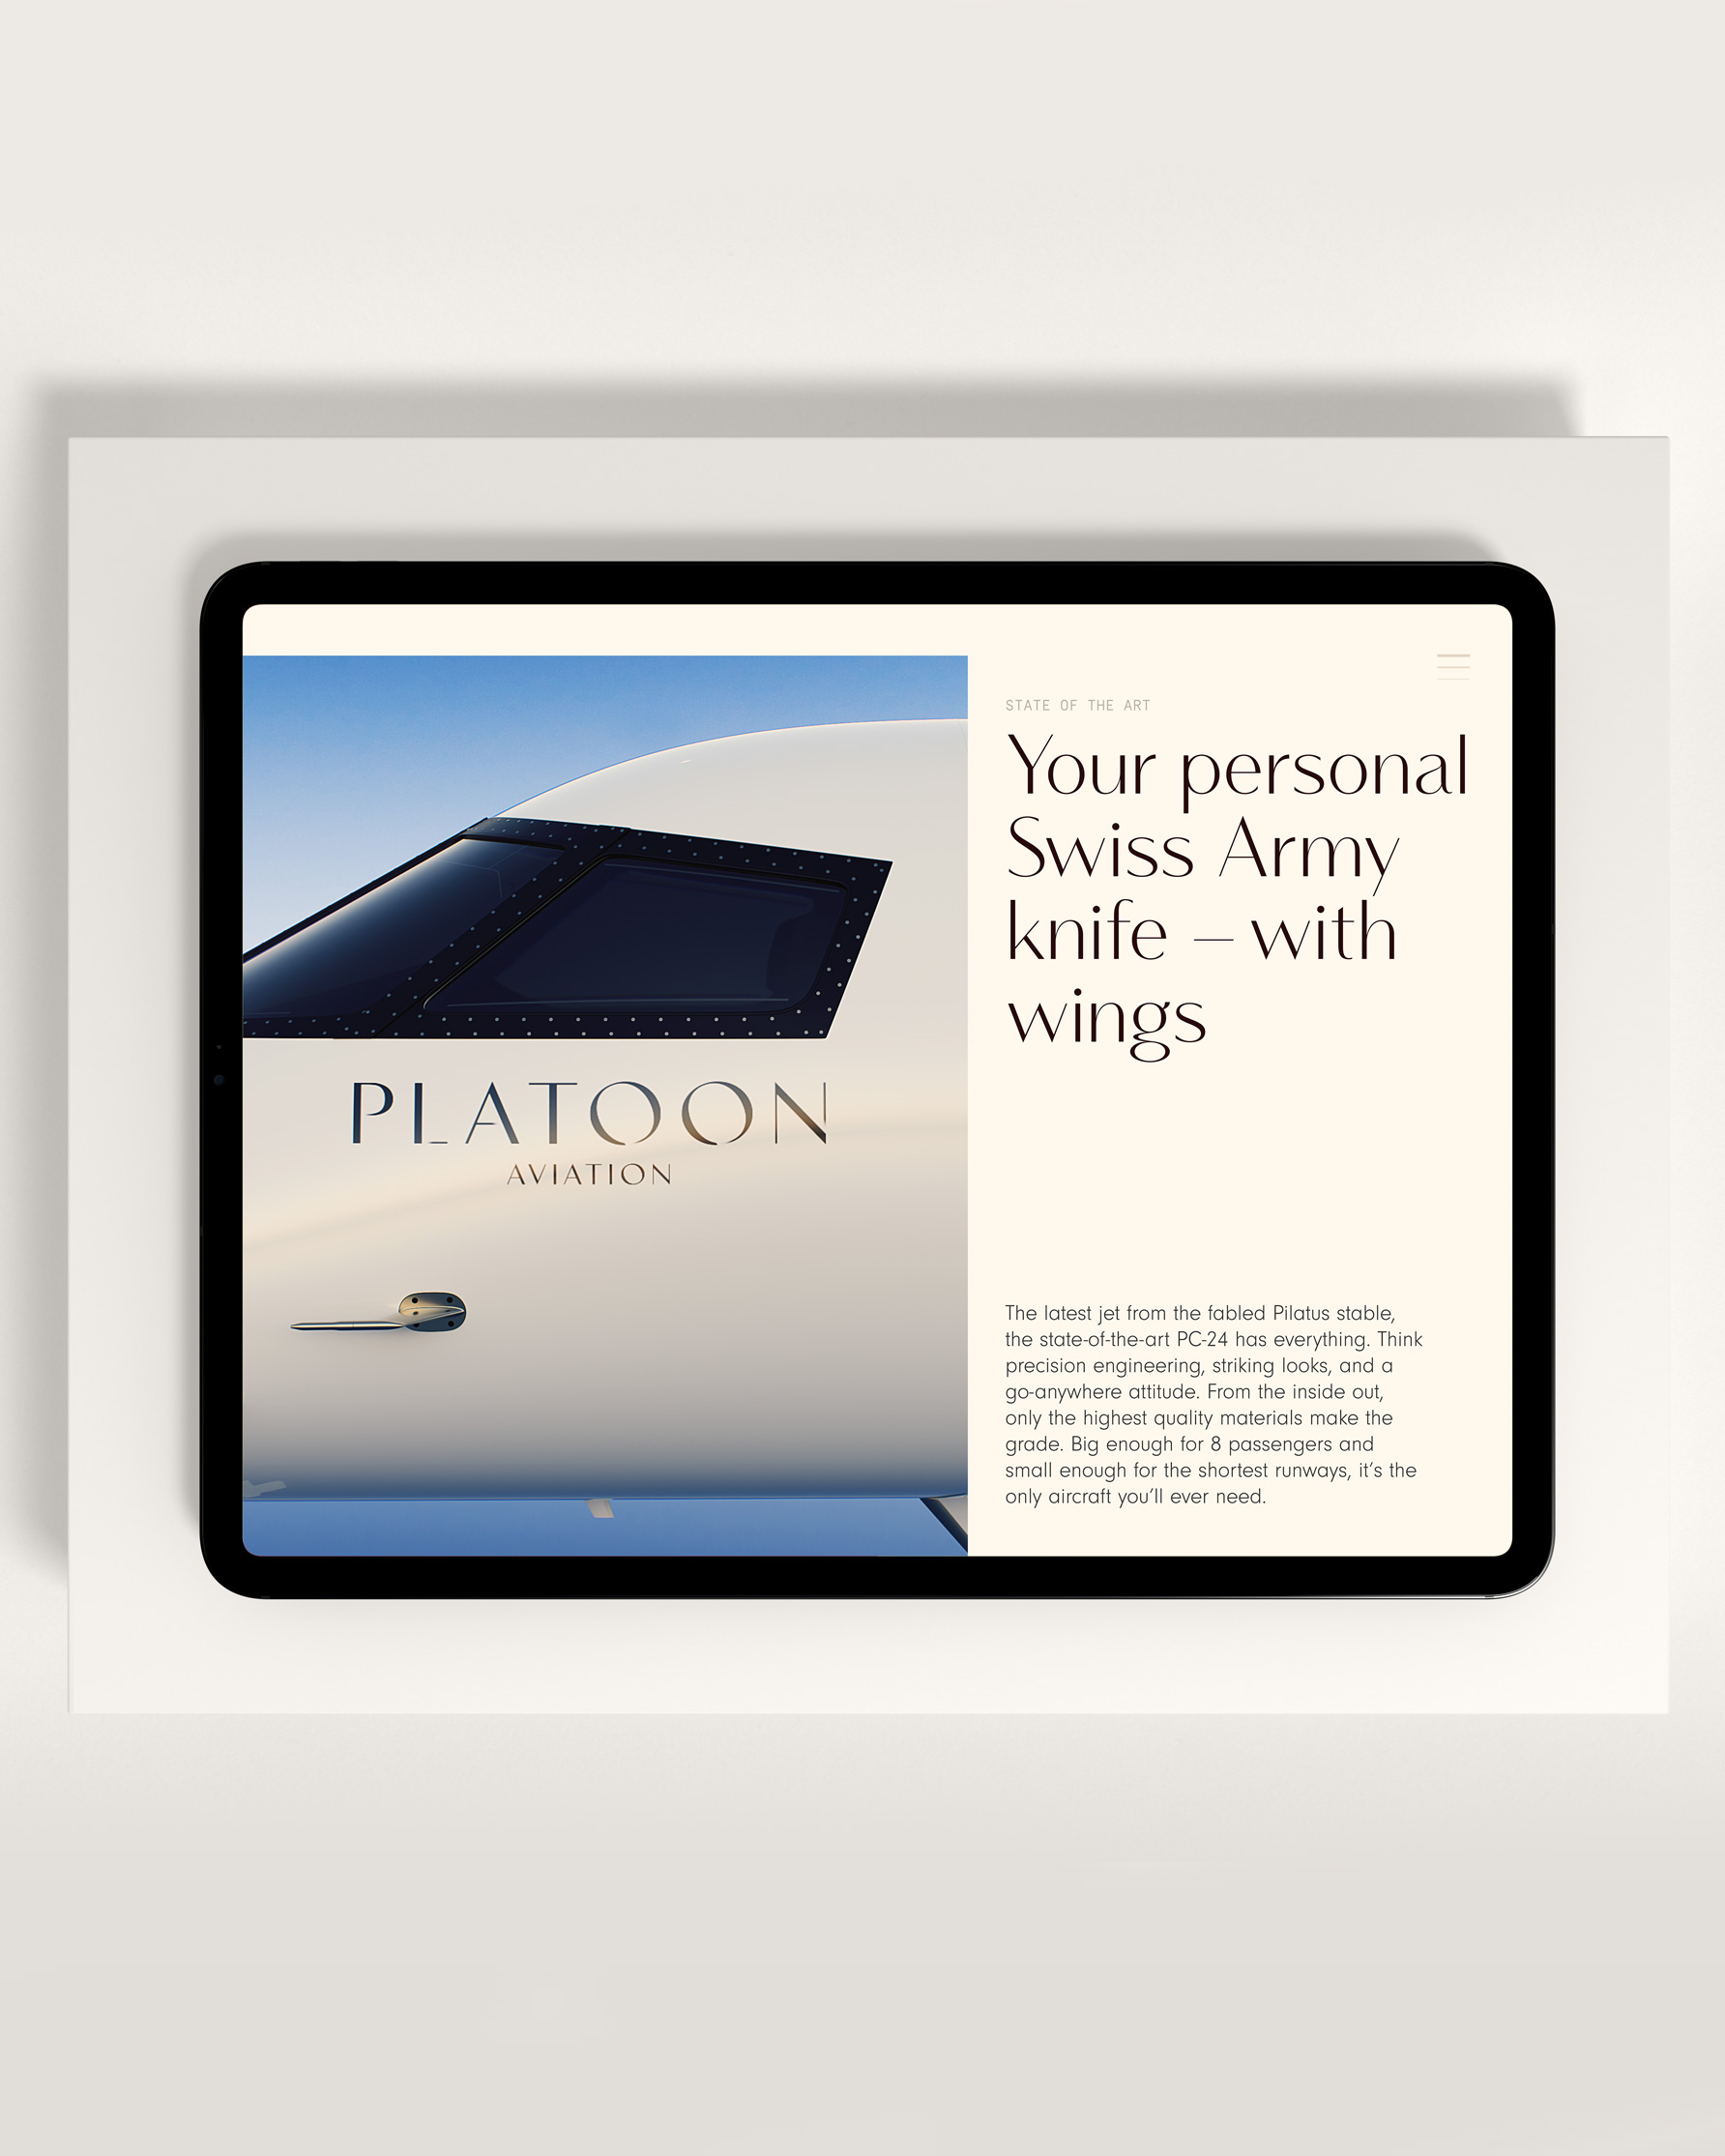 Platoon - Website Tablet